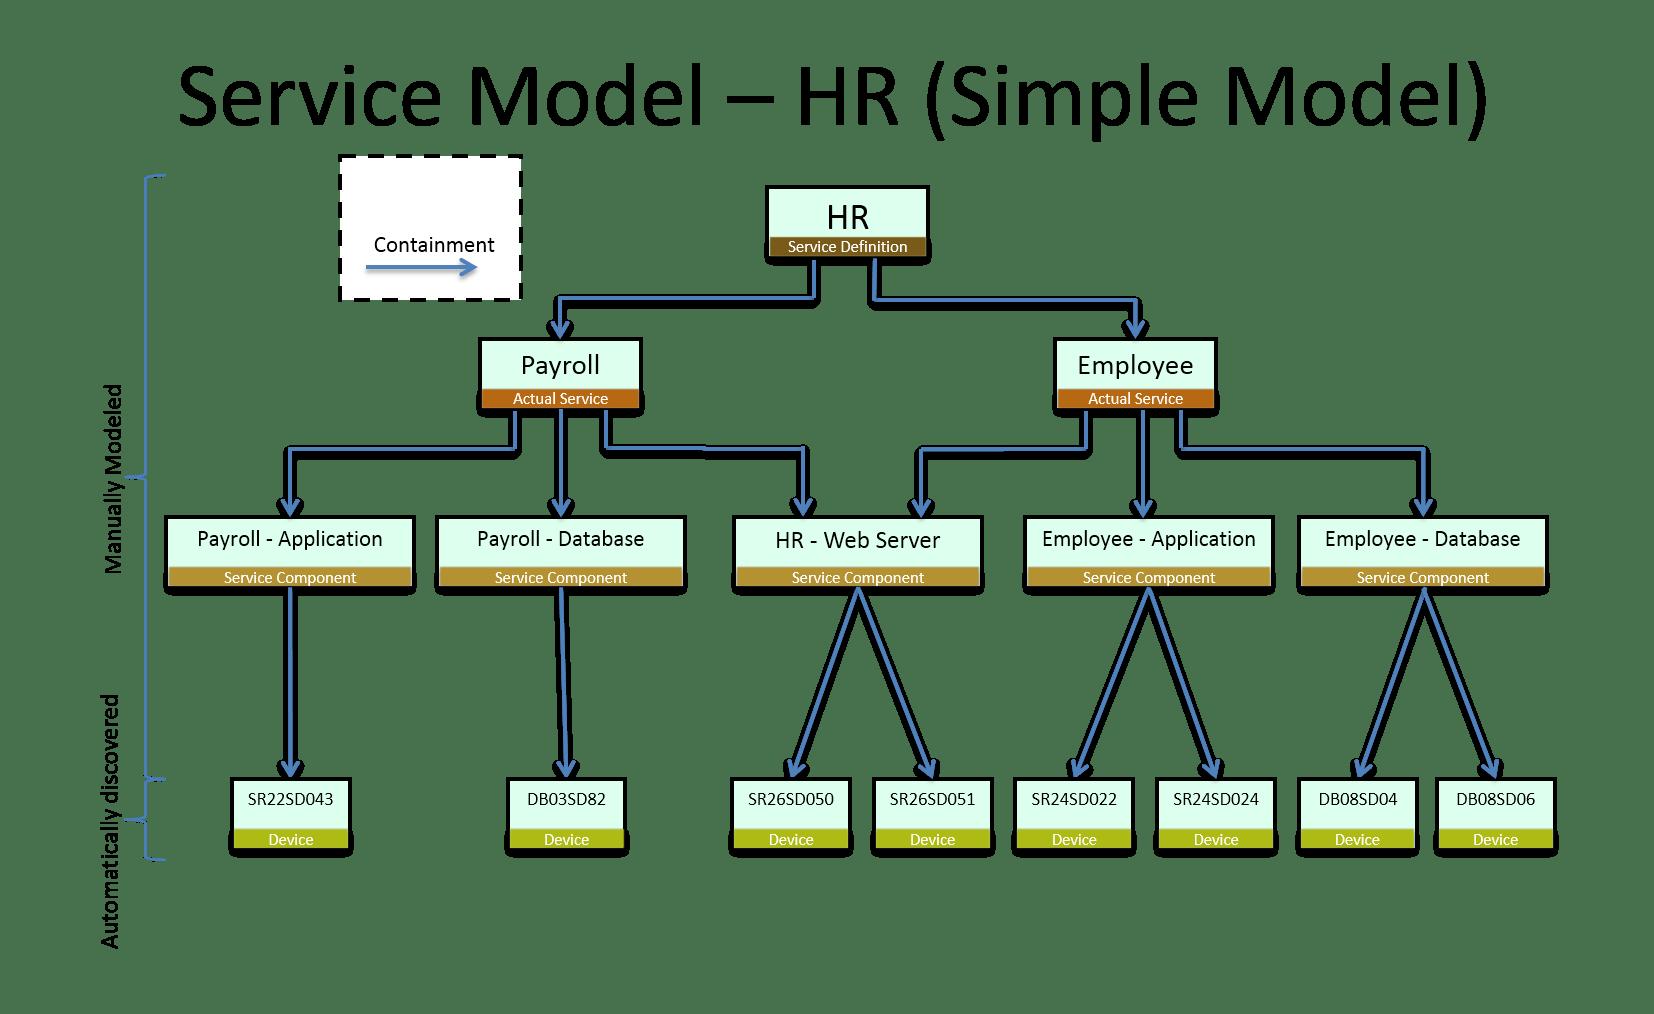 hight resolution of hr diagram model